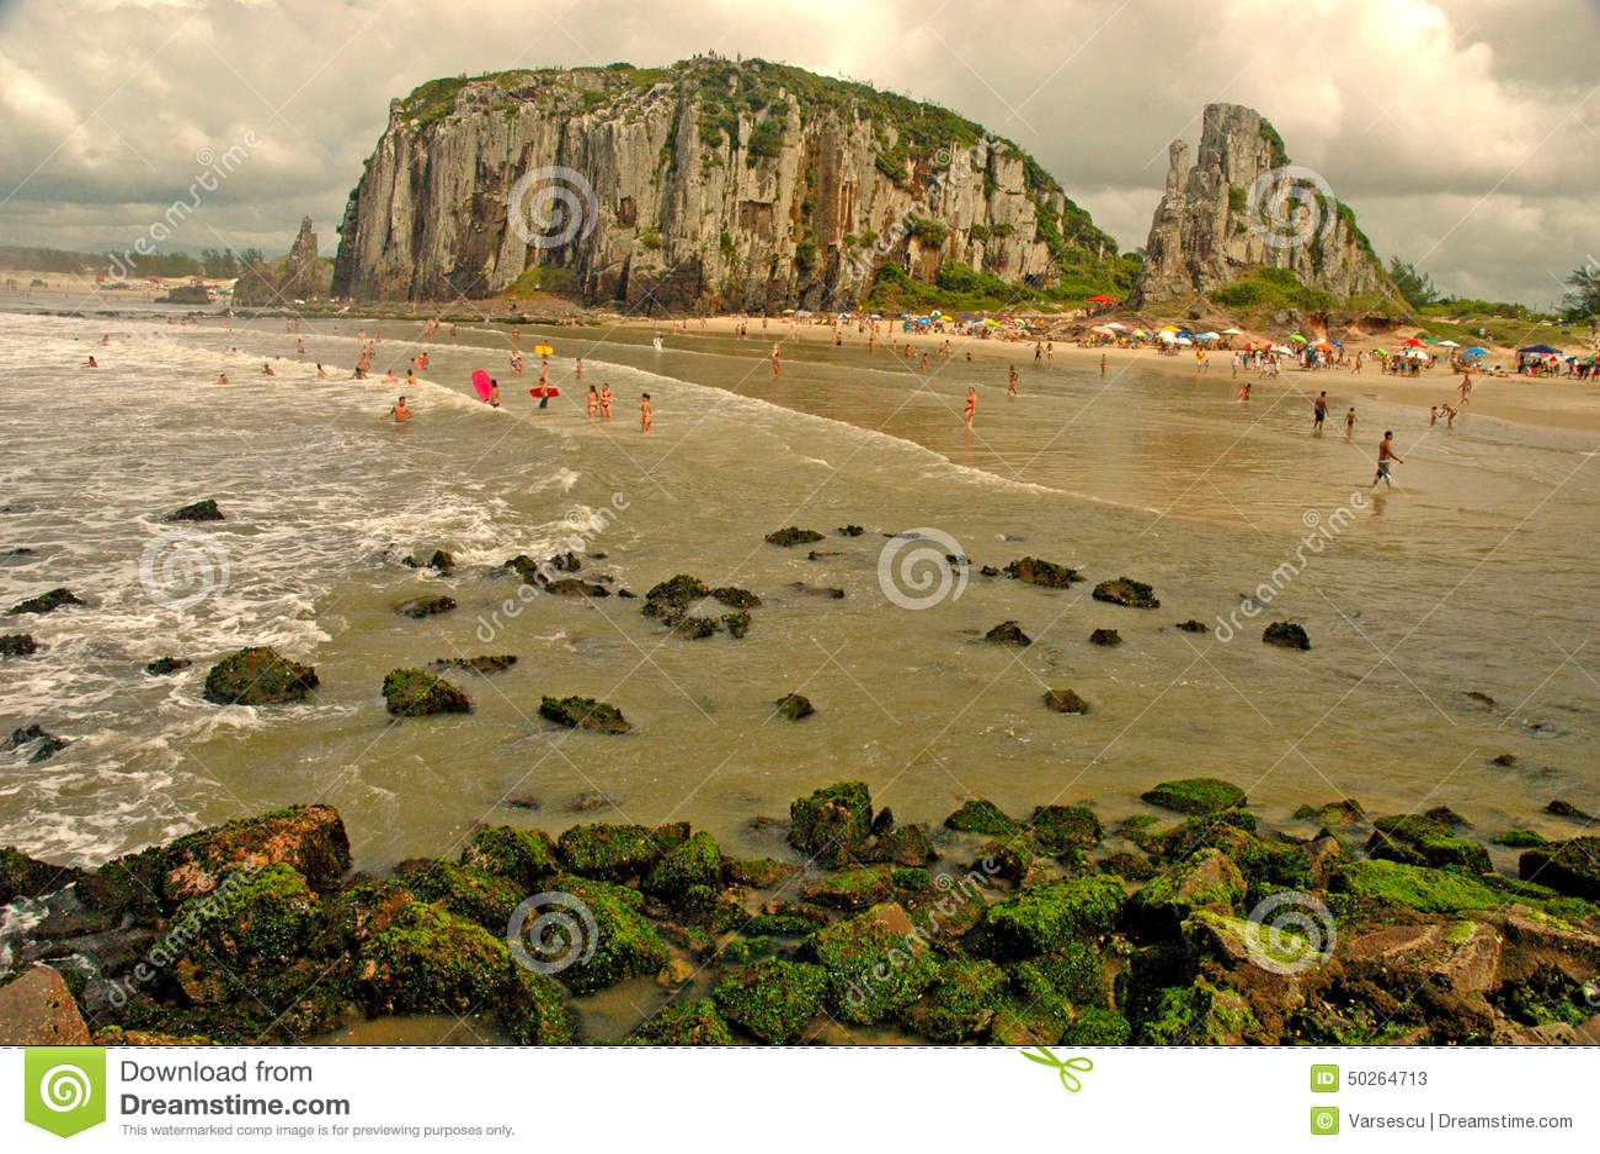 Torres Rio Grande do Sul fonte: thumbs.dreamstime.com